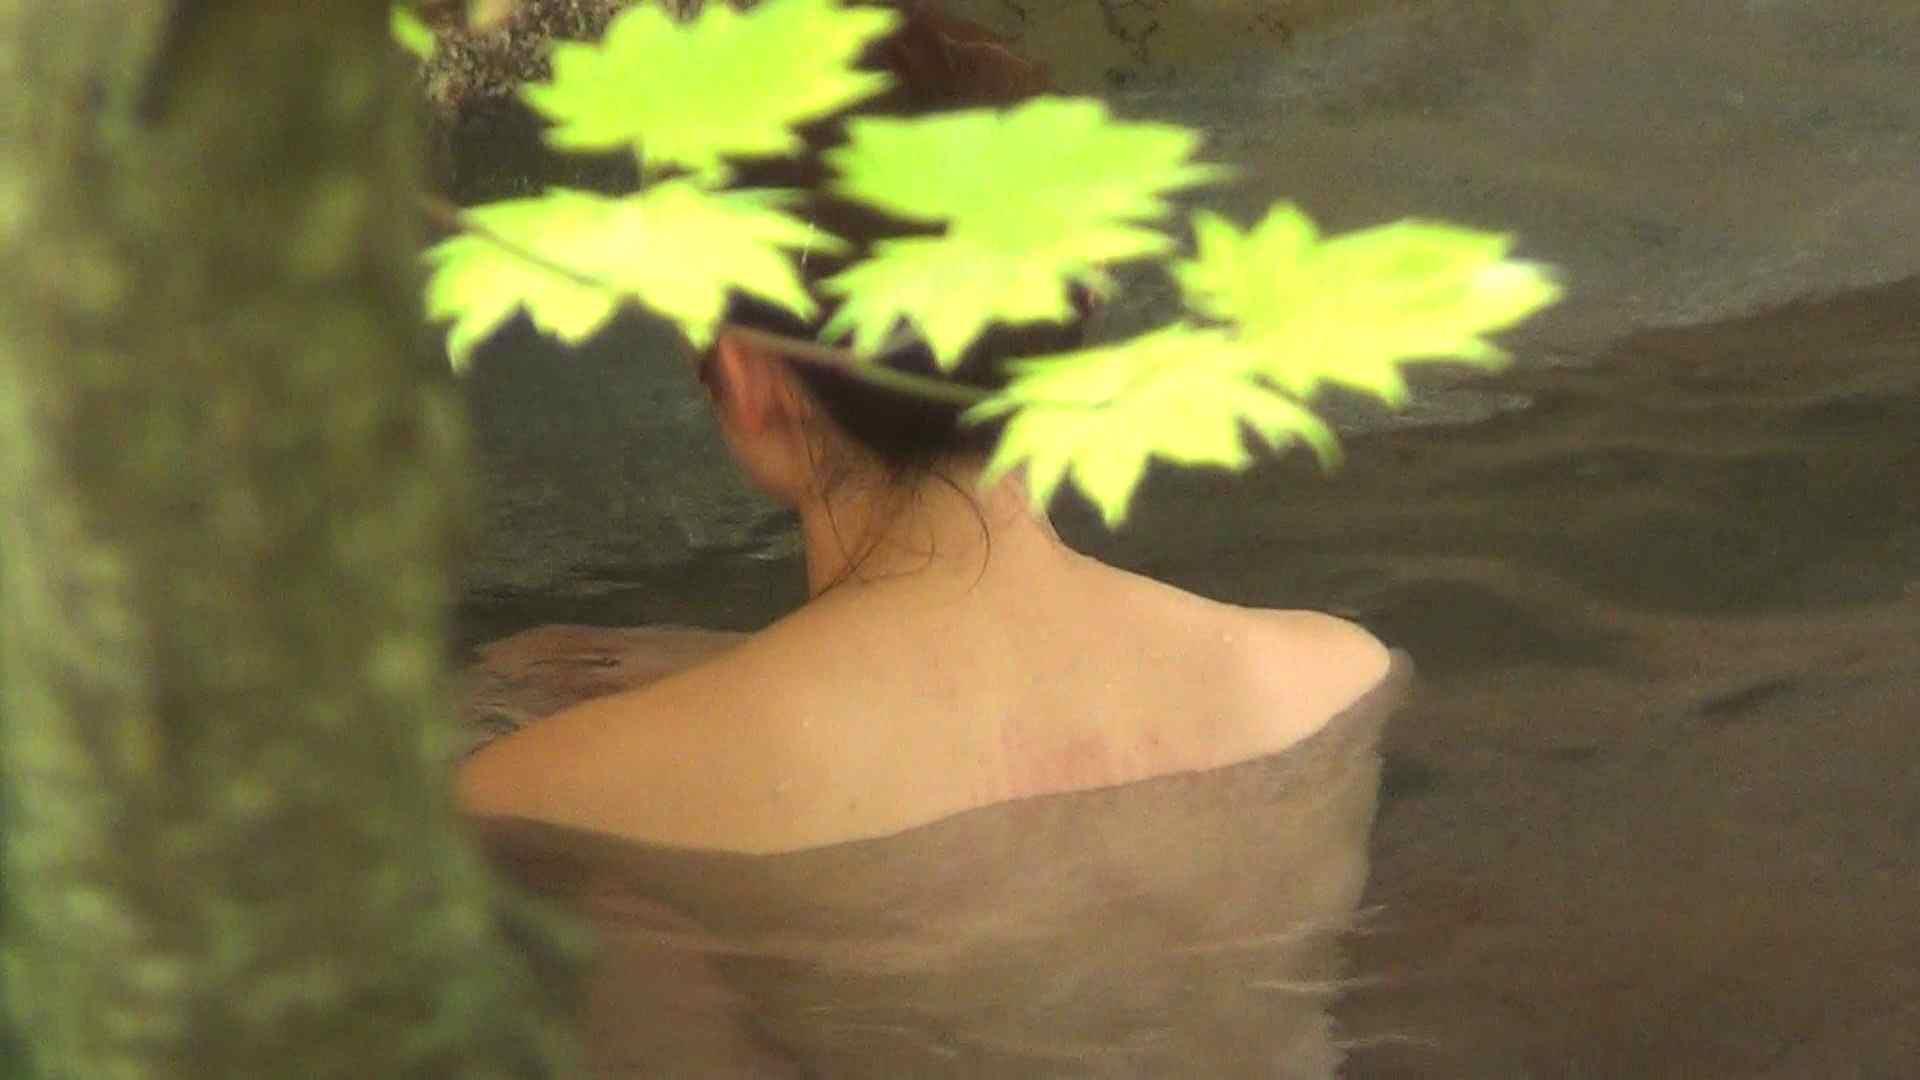 Aquaな露天風呂Vol.257 0  11連発 8